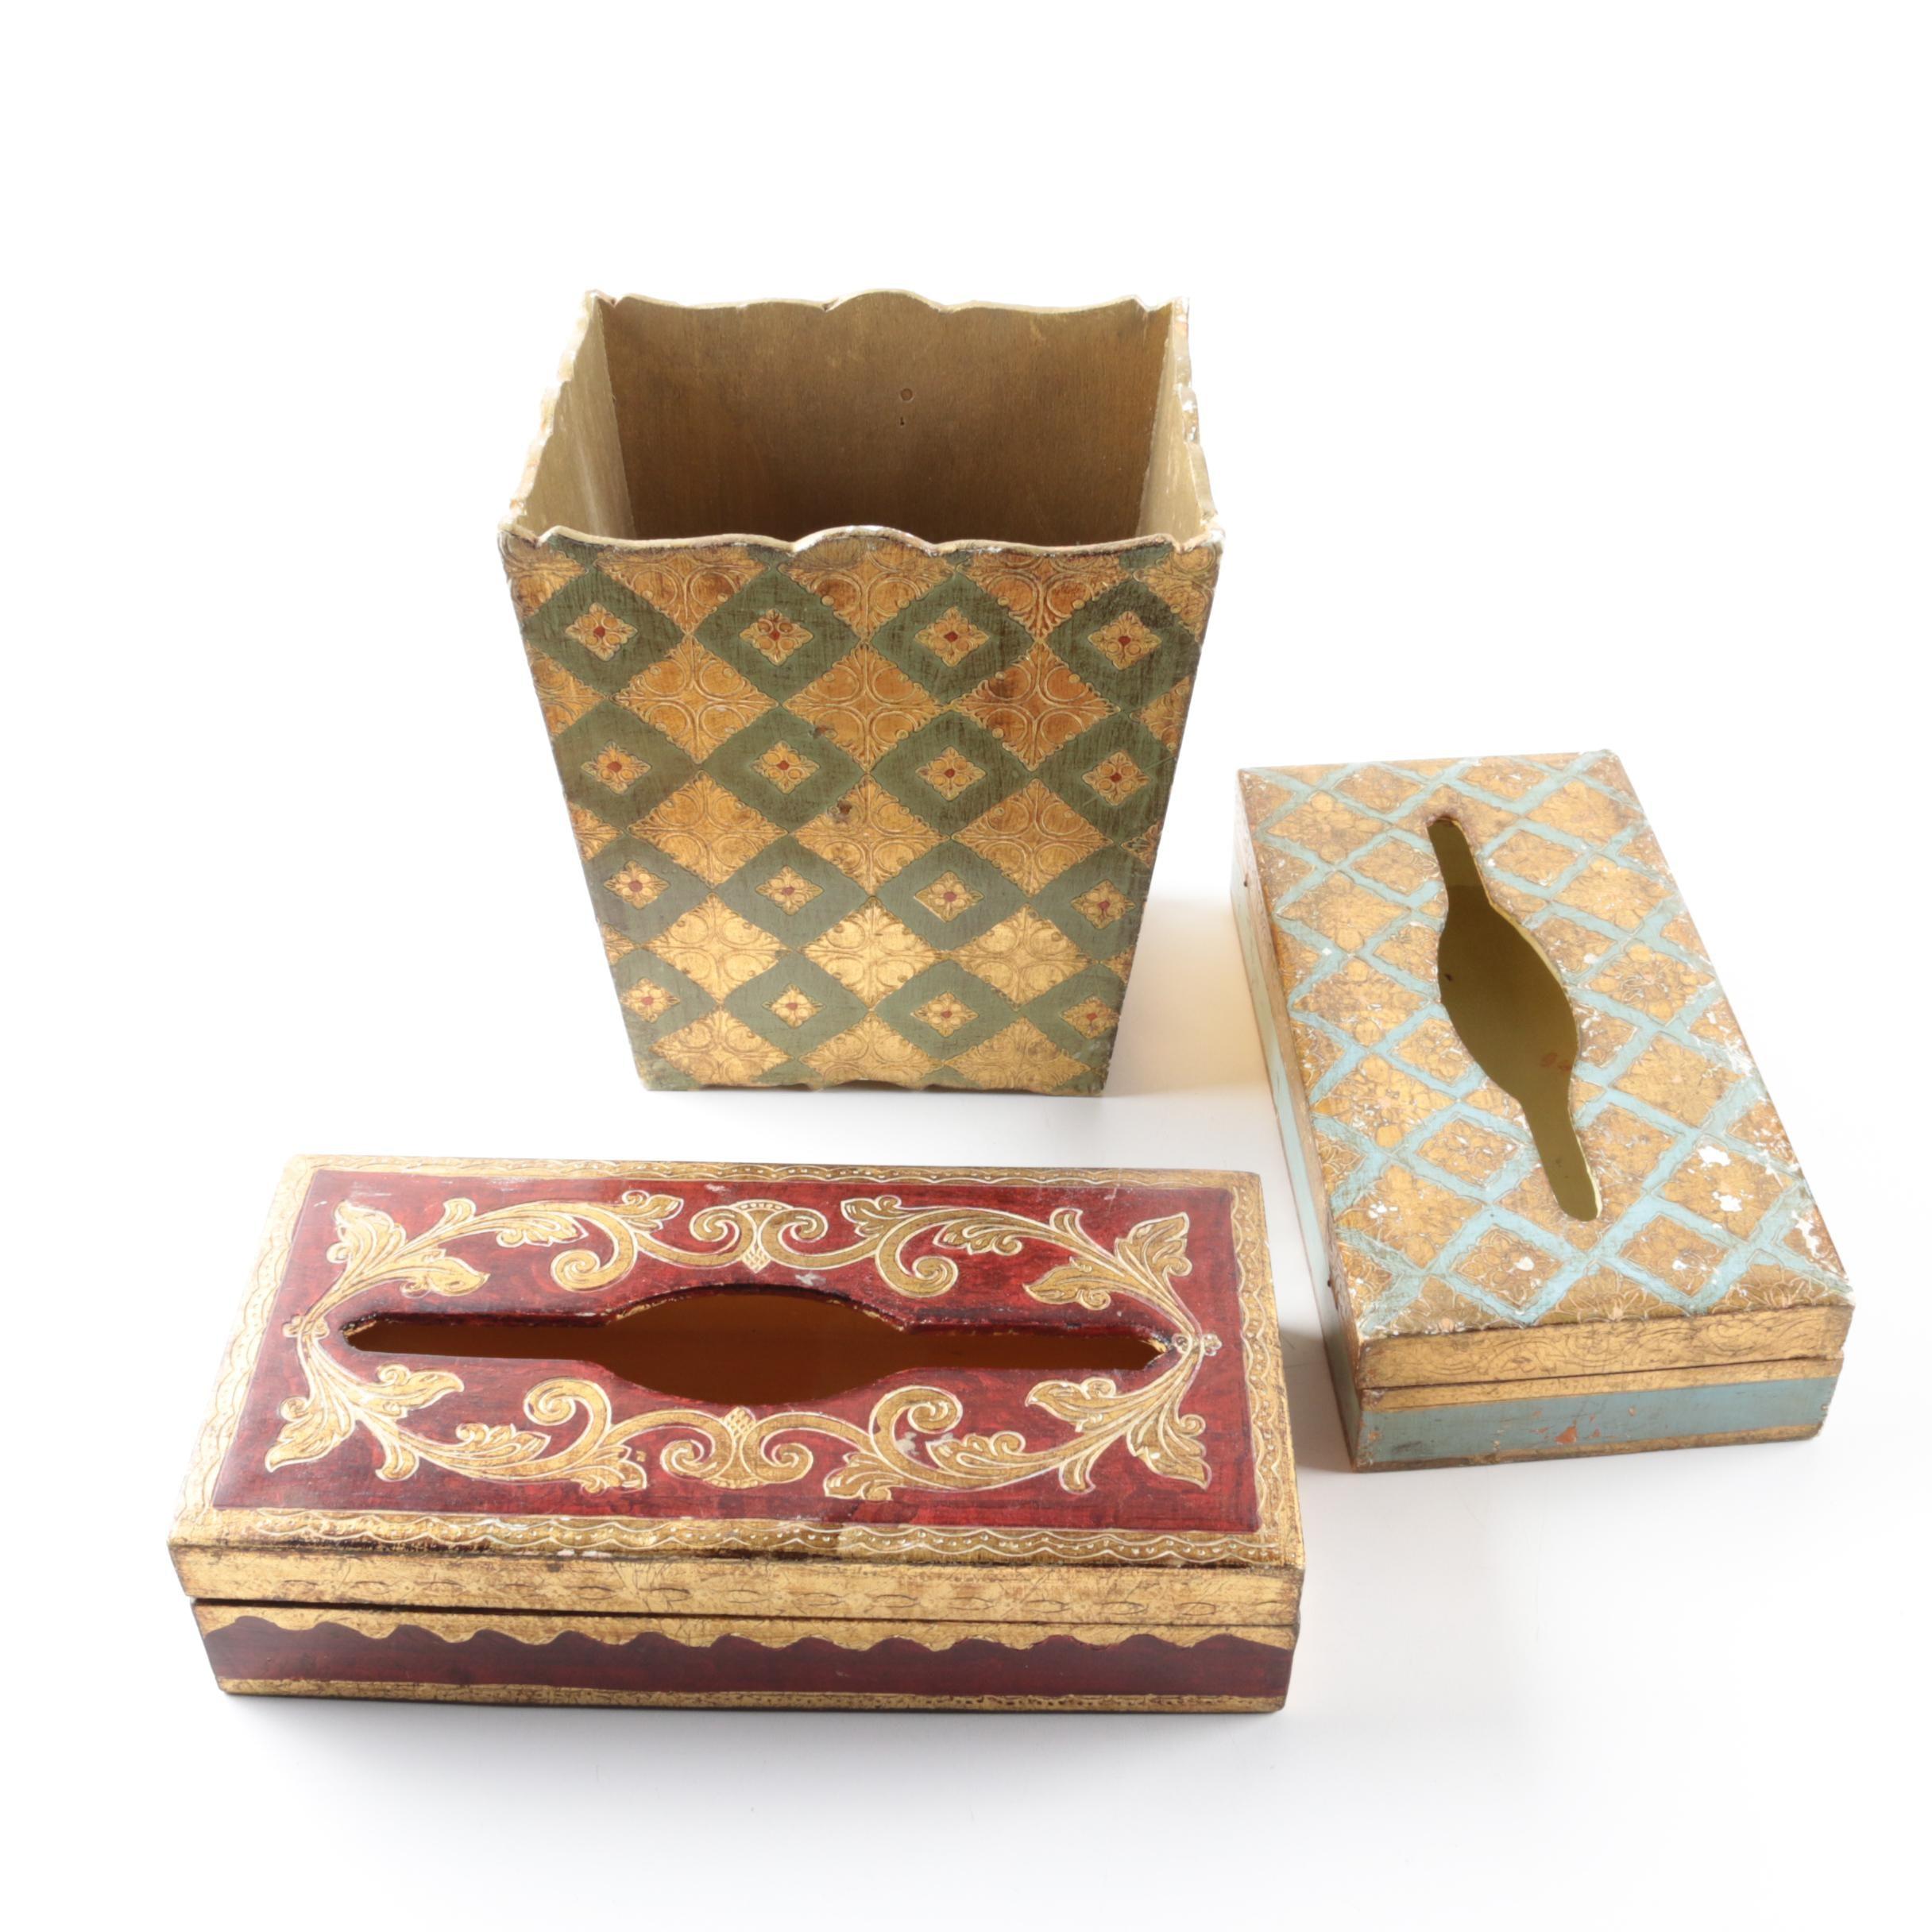 Italian Florentine Wood Tissue Holders and Trash Receptacle